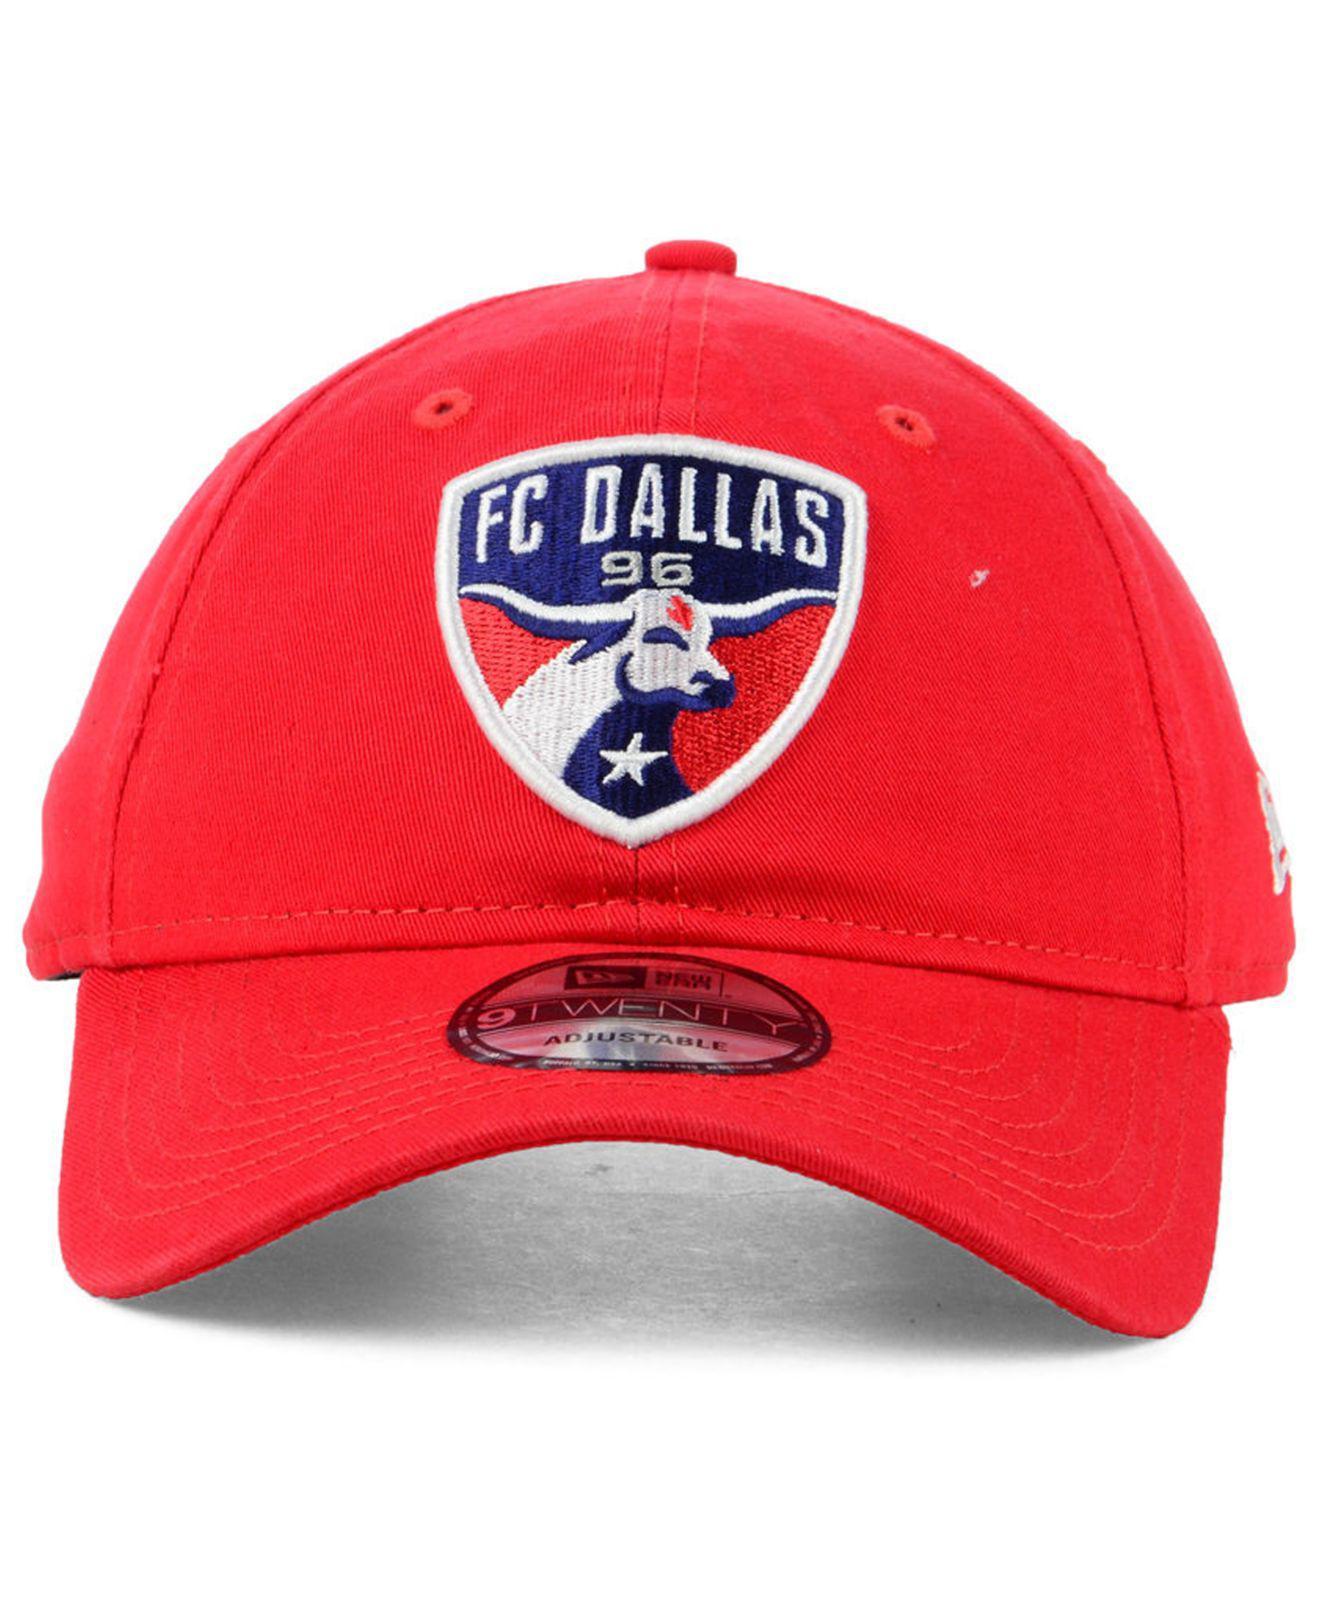 detailed pictures 9e493 00db6 ... uk lyst ktz fc dallas core 9twenty strapback cap in red for men 2baf5  17a21